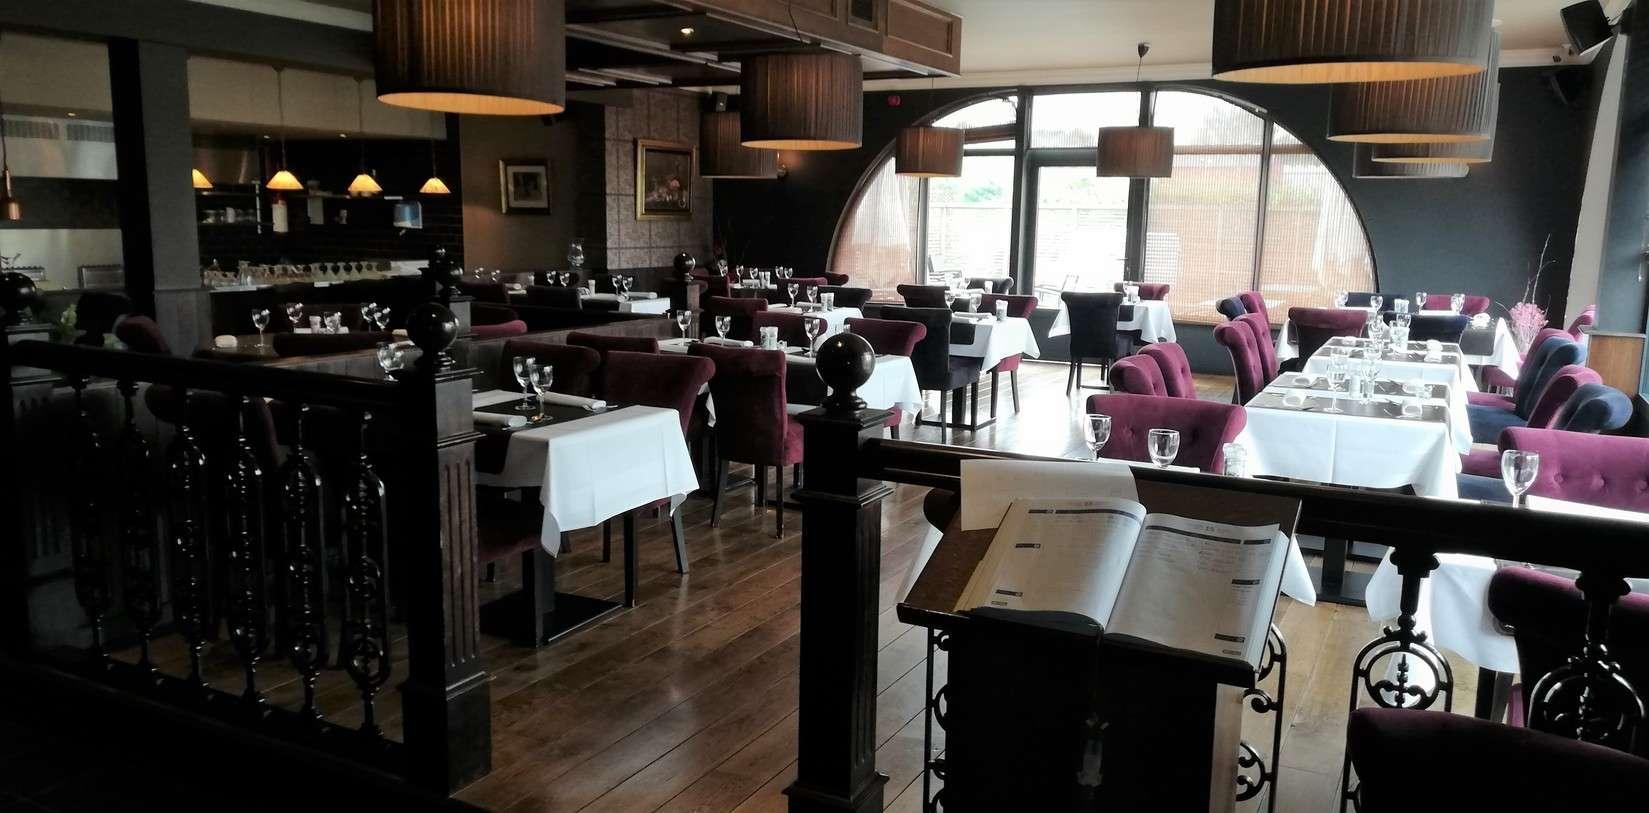 Restaurant Namur - Ou manger à Namur